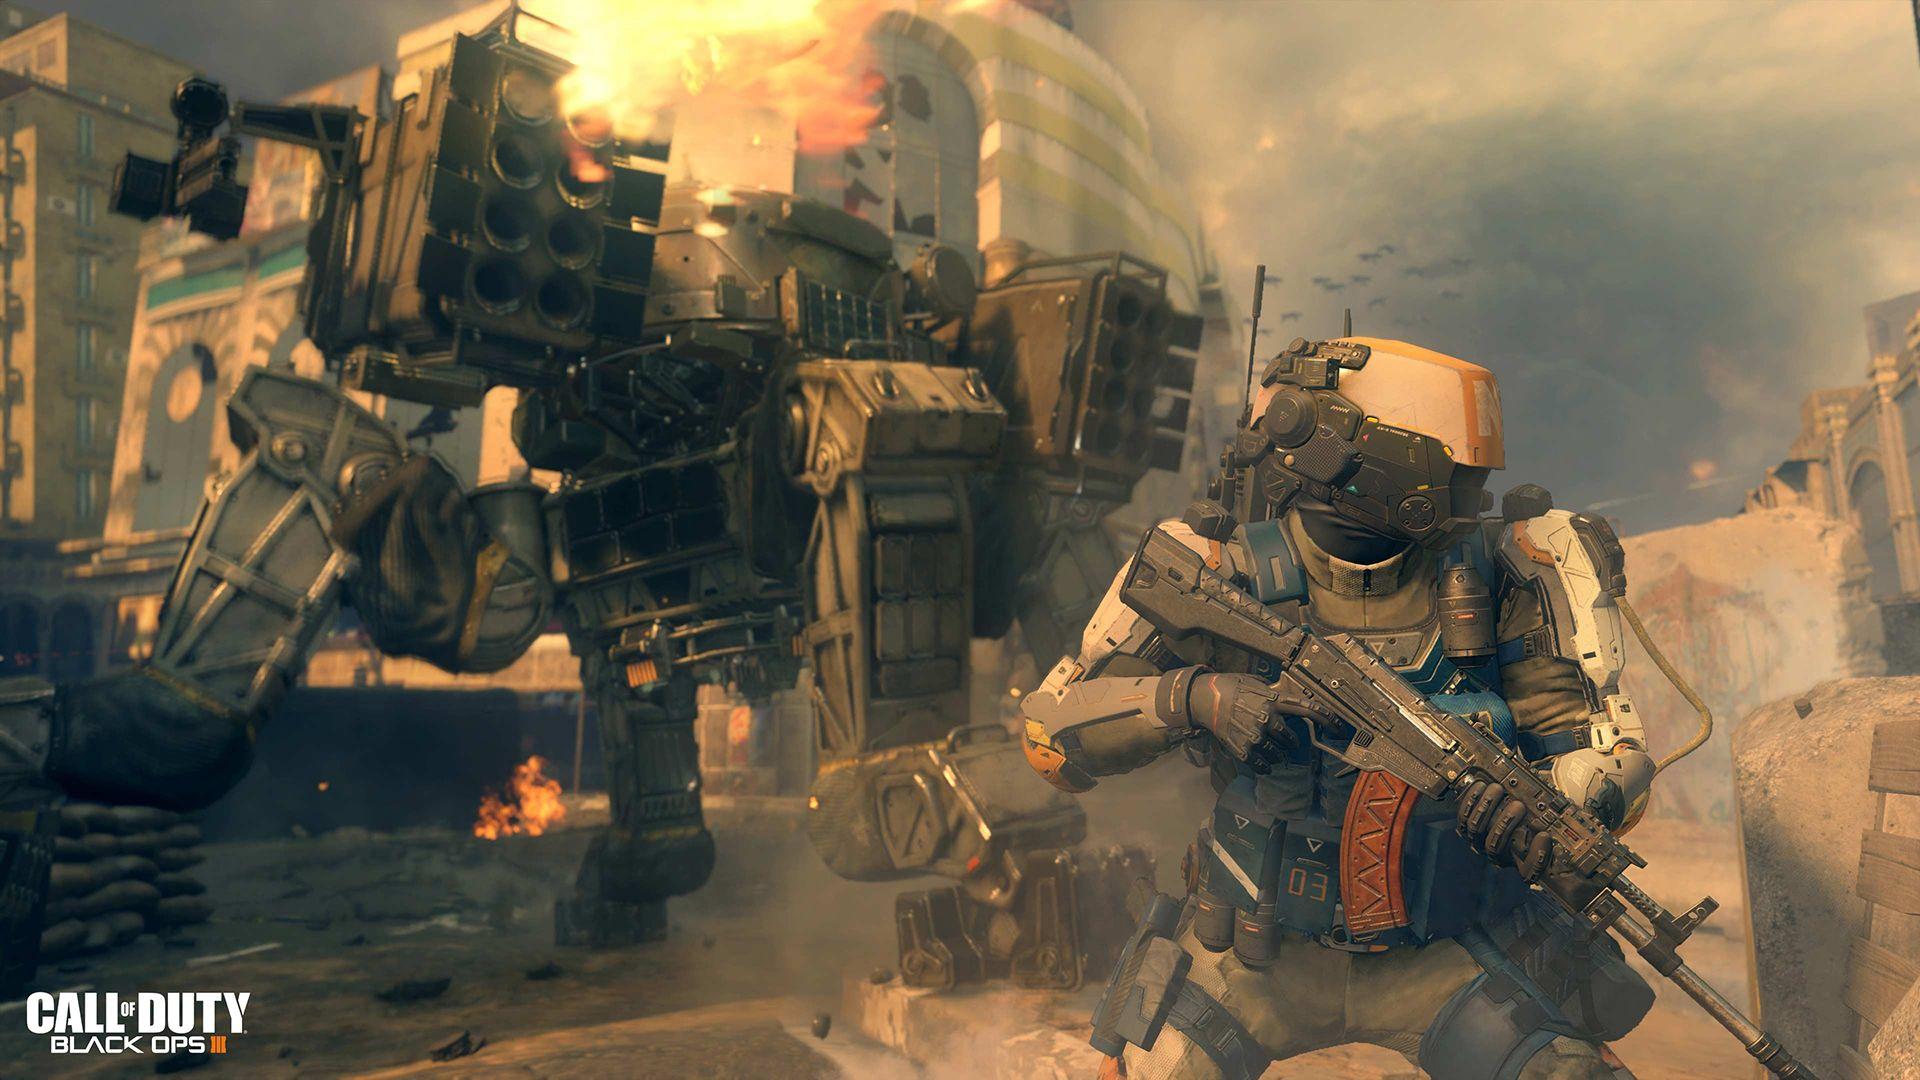 Call of Duty: Black Ops III (PS3) - 7